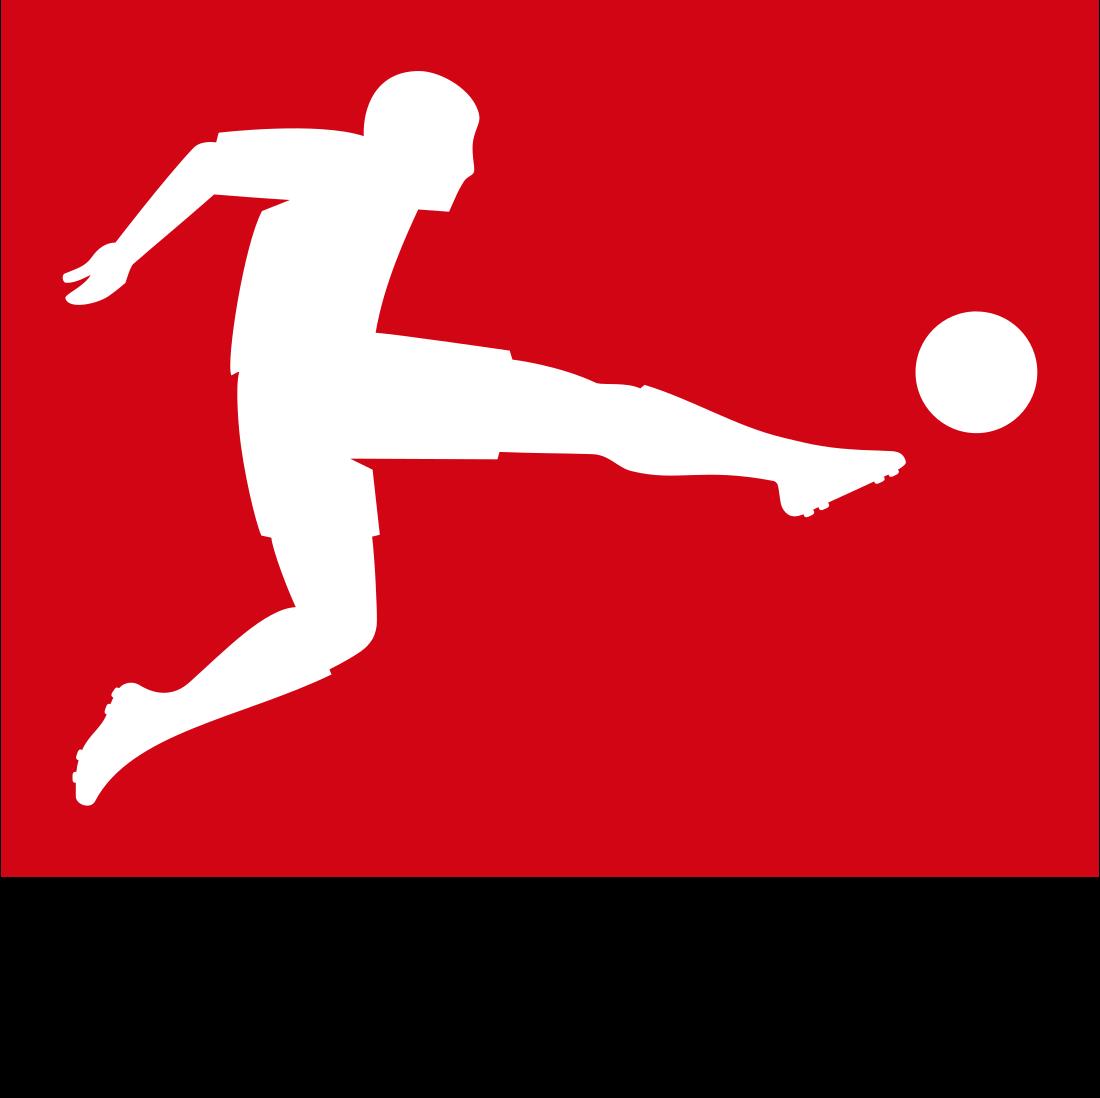 Bundesliga logo.